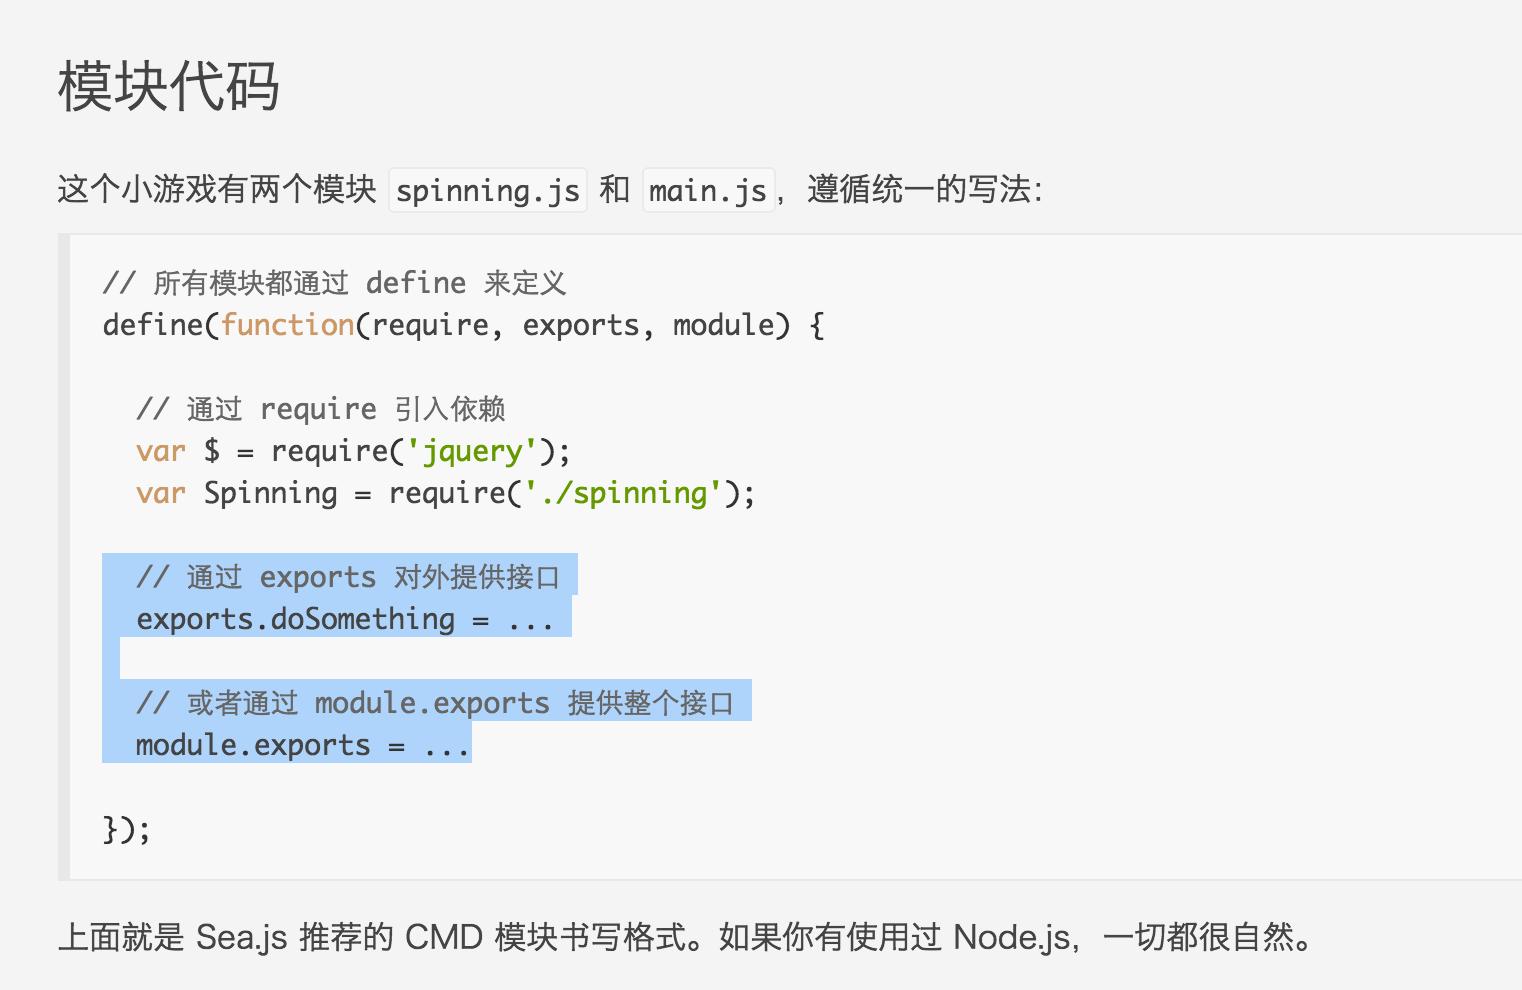 Module.exports和exports的区别